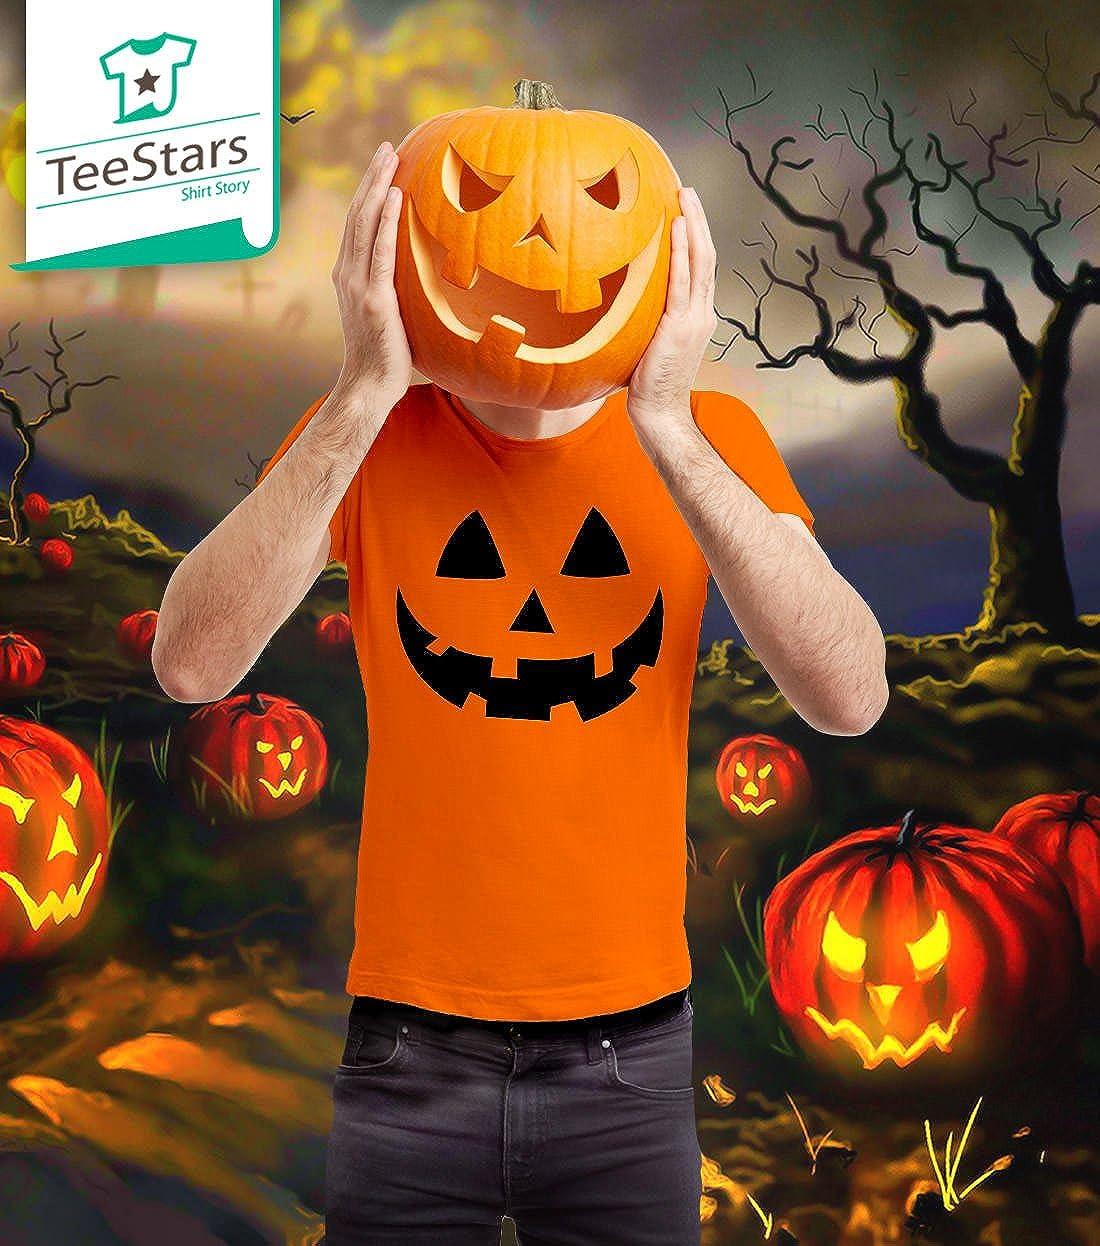 b2222f267ec8d Amazon.com: Jack O' Lantern - Smiling Pumpkin Face - Easy Halloween Costume  Fun T-Shirt: Clothing